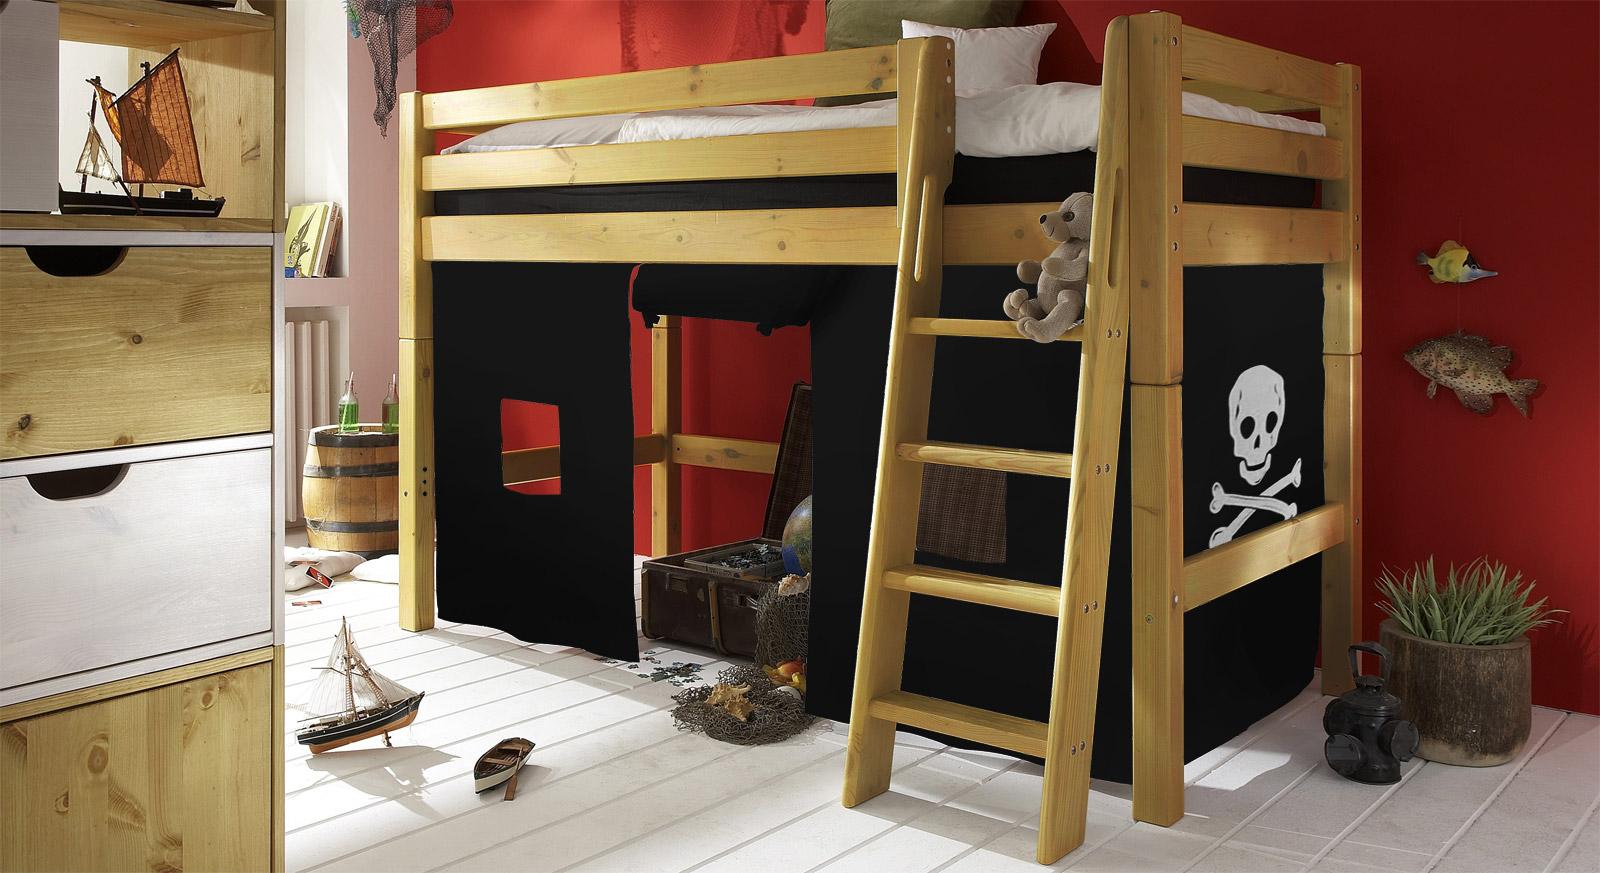 Etagenbett Piratenschiff : Piratenschiff bett kinderbett schiffsbett von oli niki in